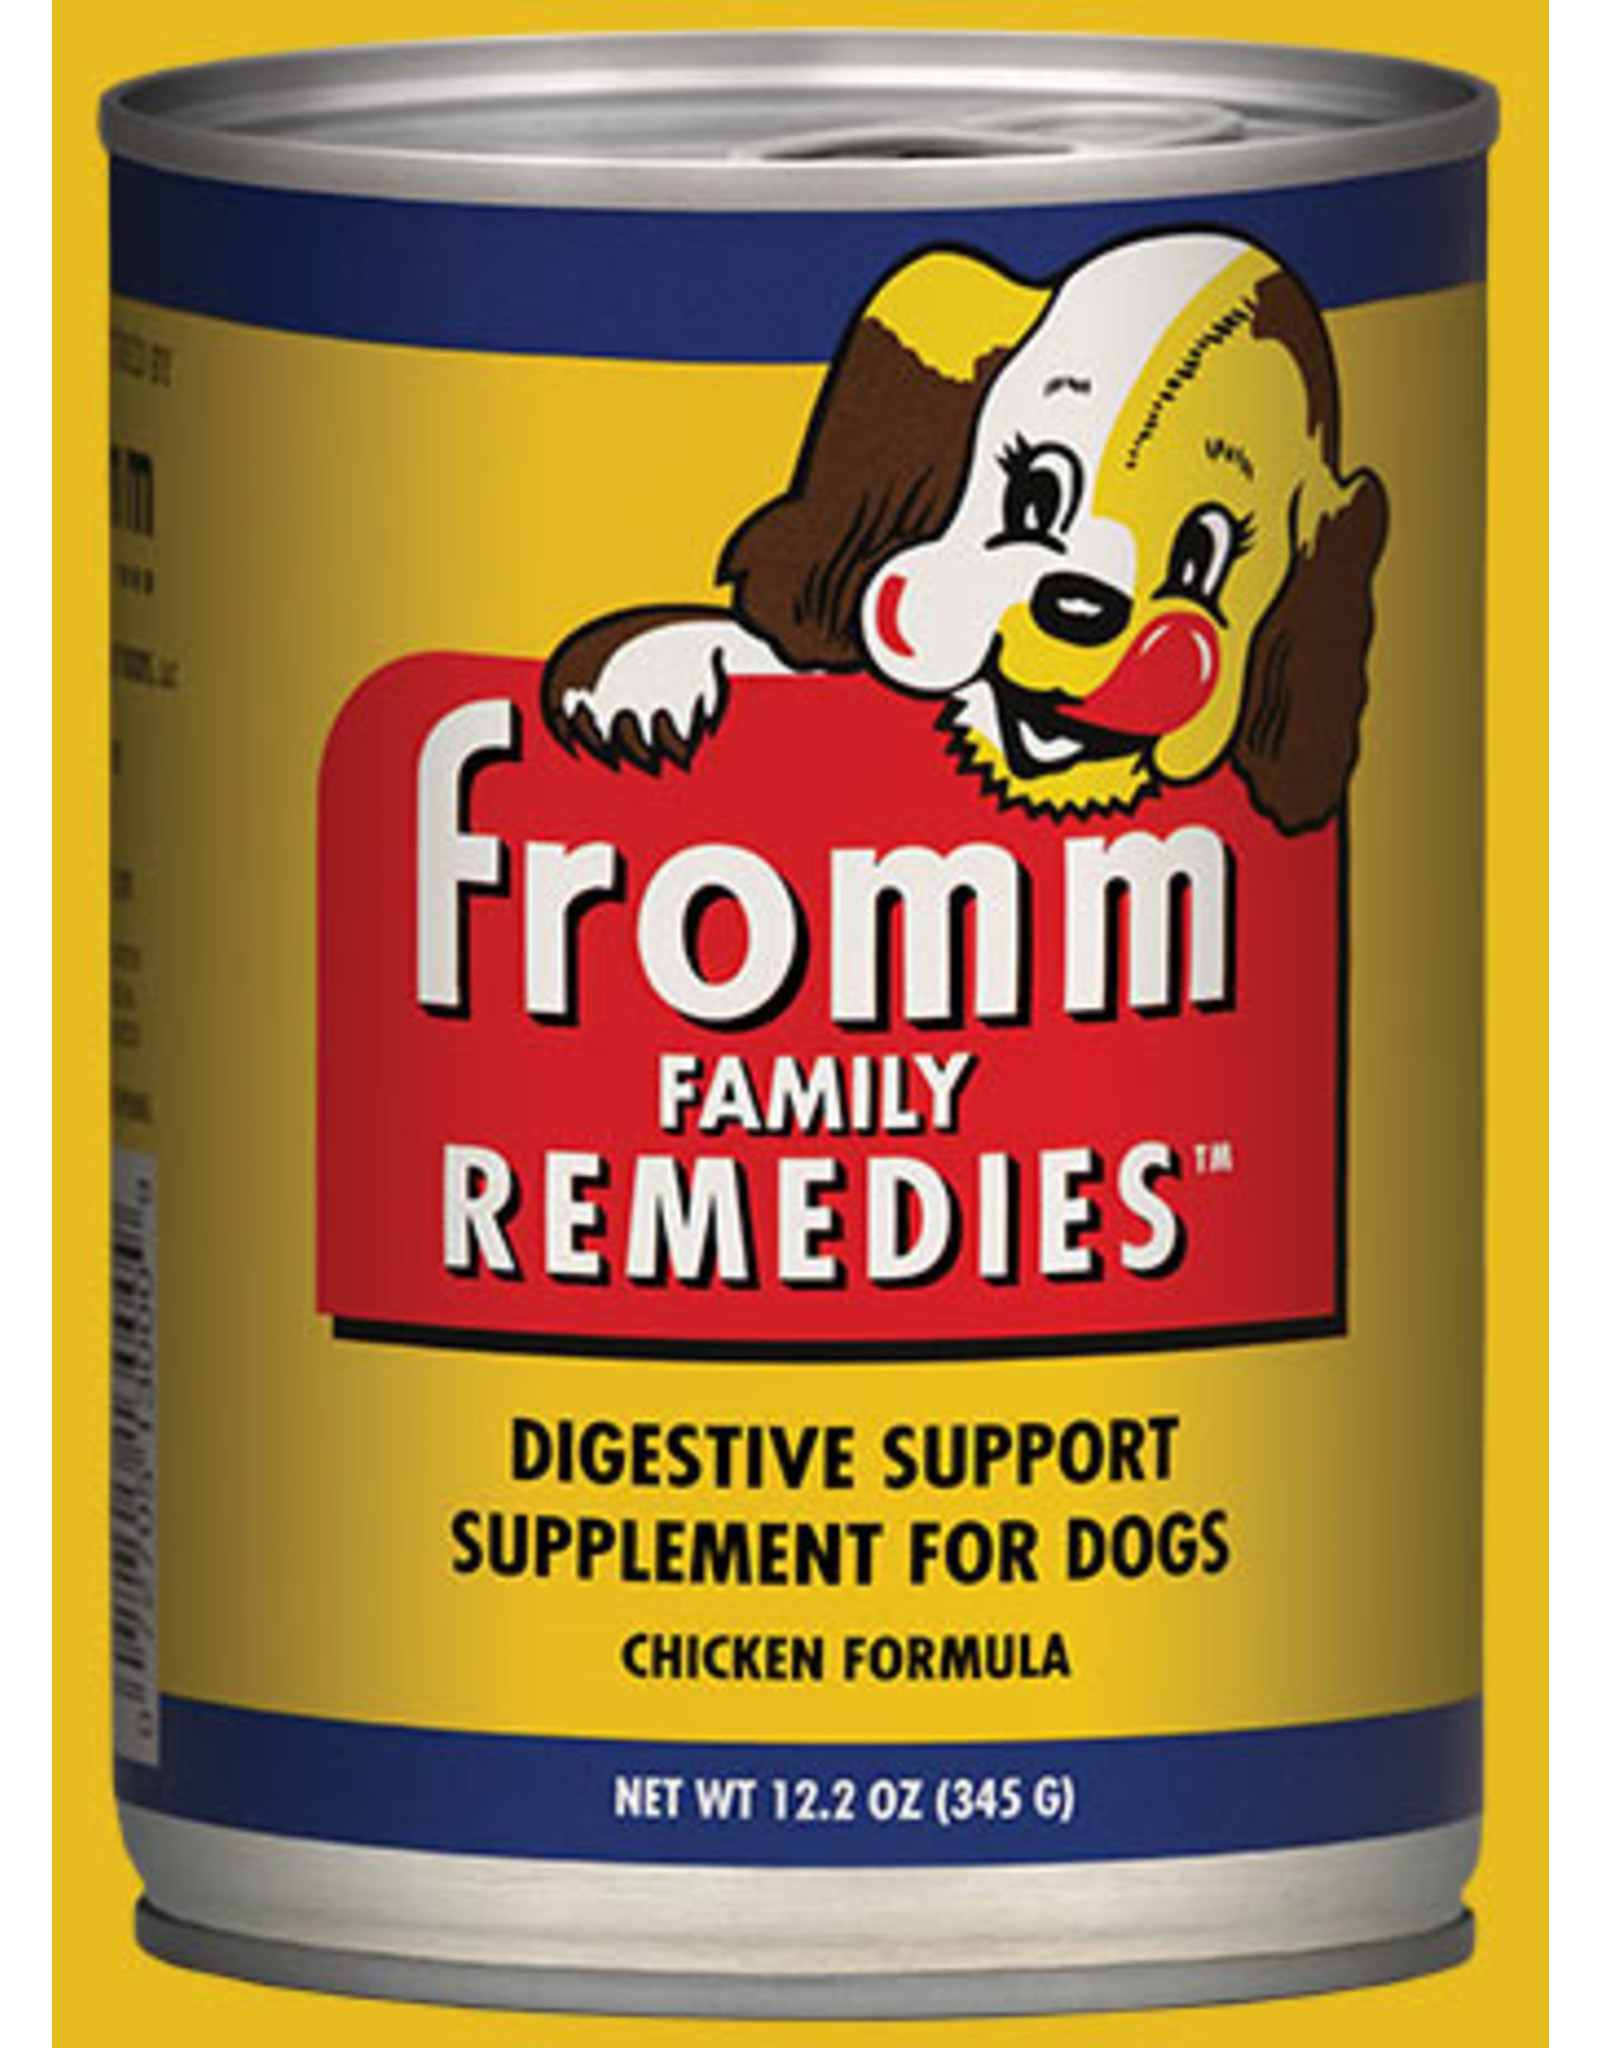 Fromm Fromm Wet Dog Food Remedies Digestive Support Supplement Chicken Formula 12.2oz